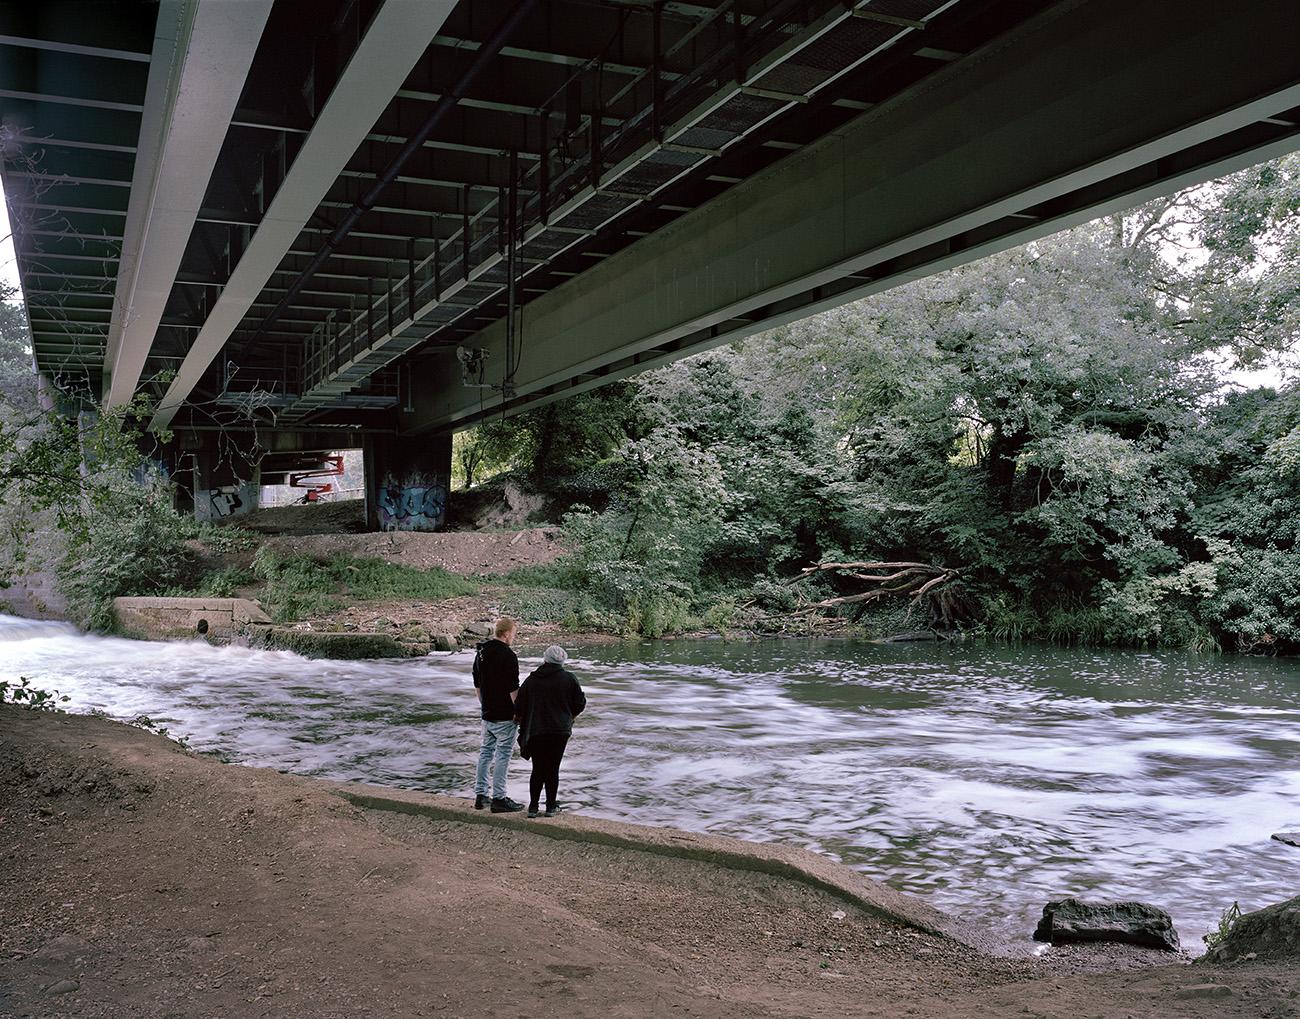 Water coursing beneath the concrete bridge above